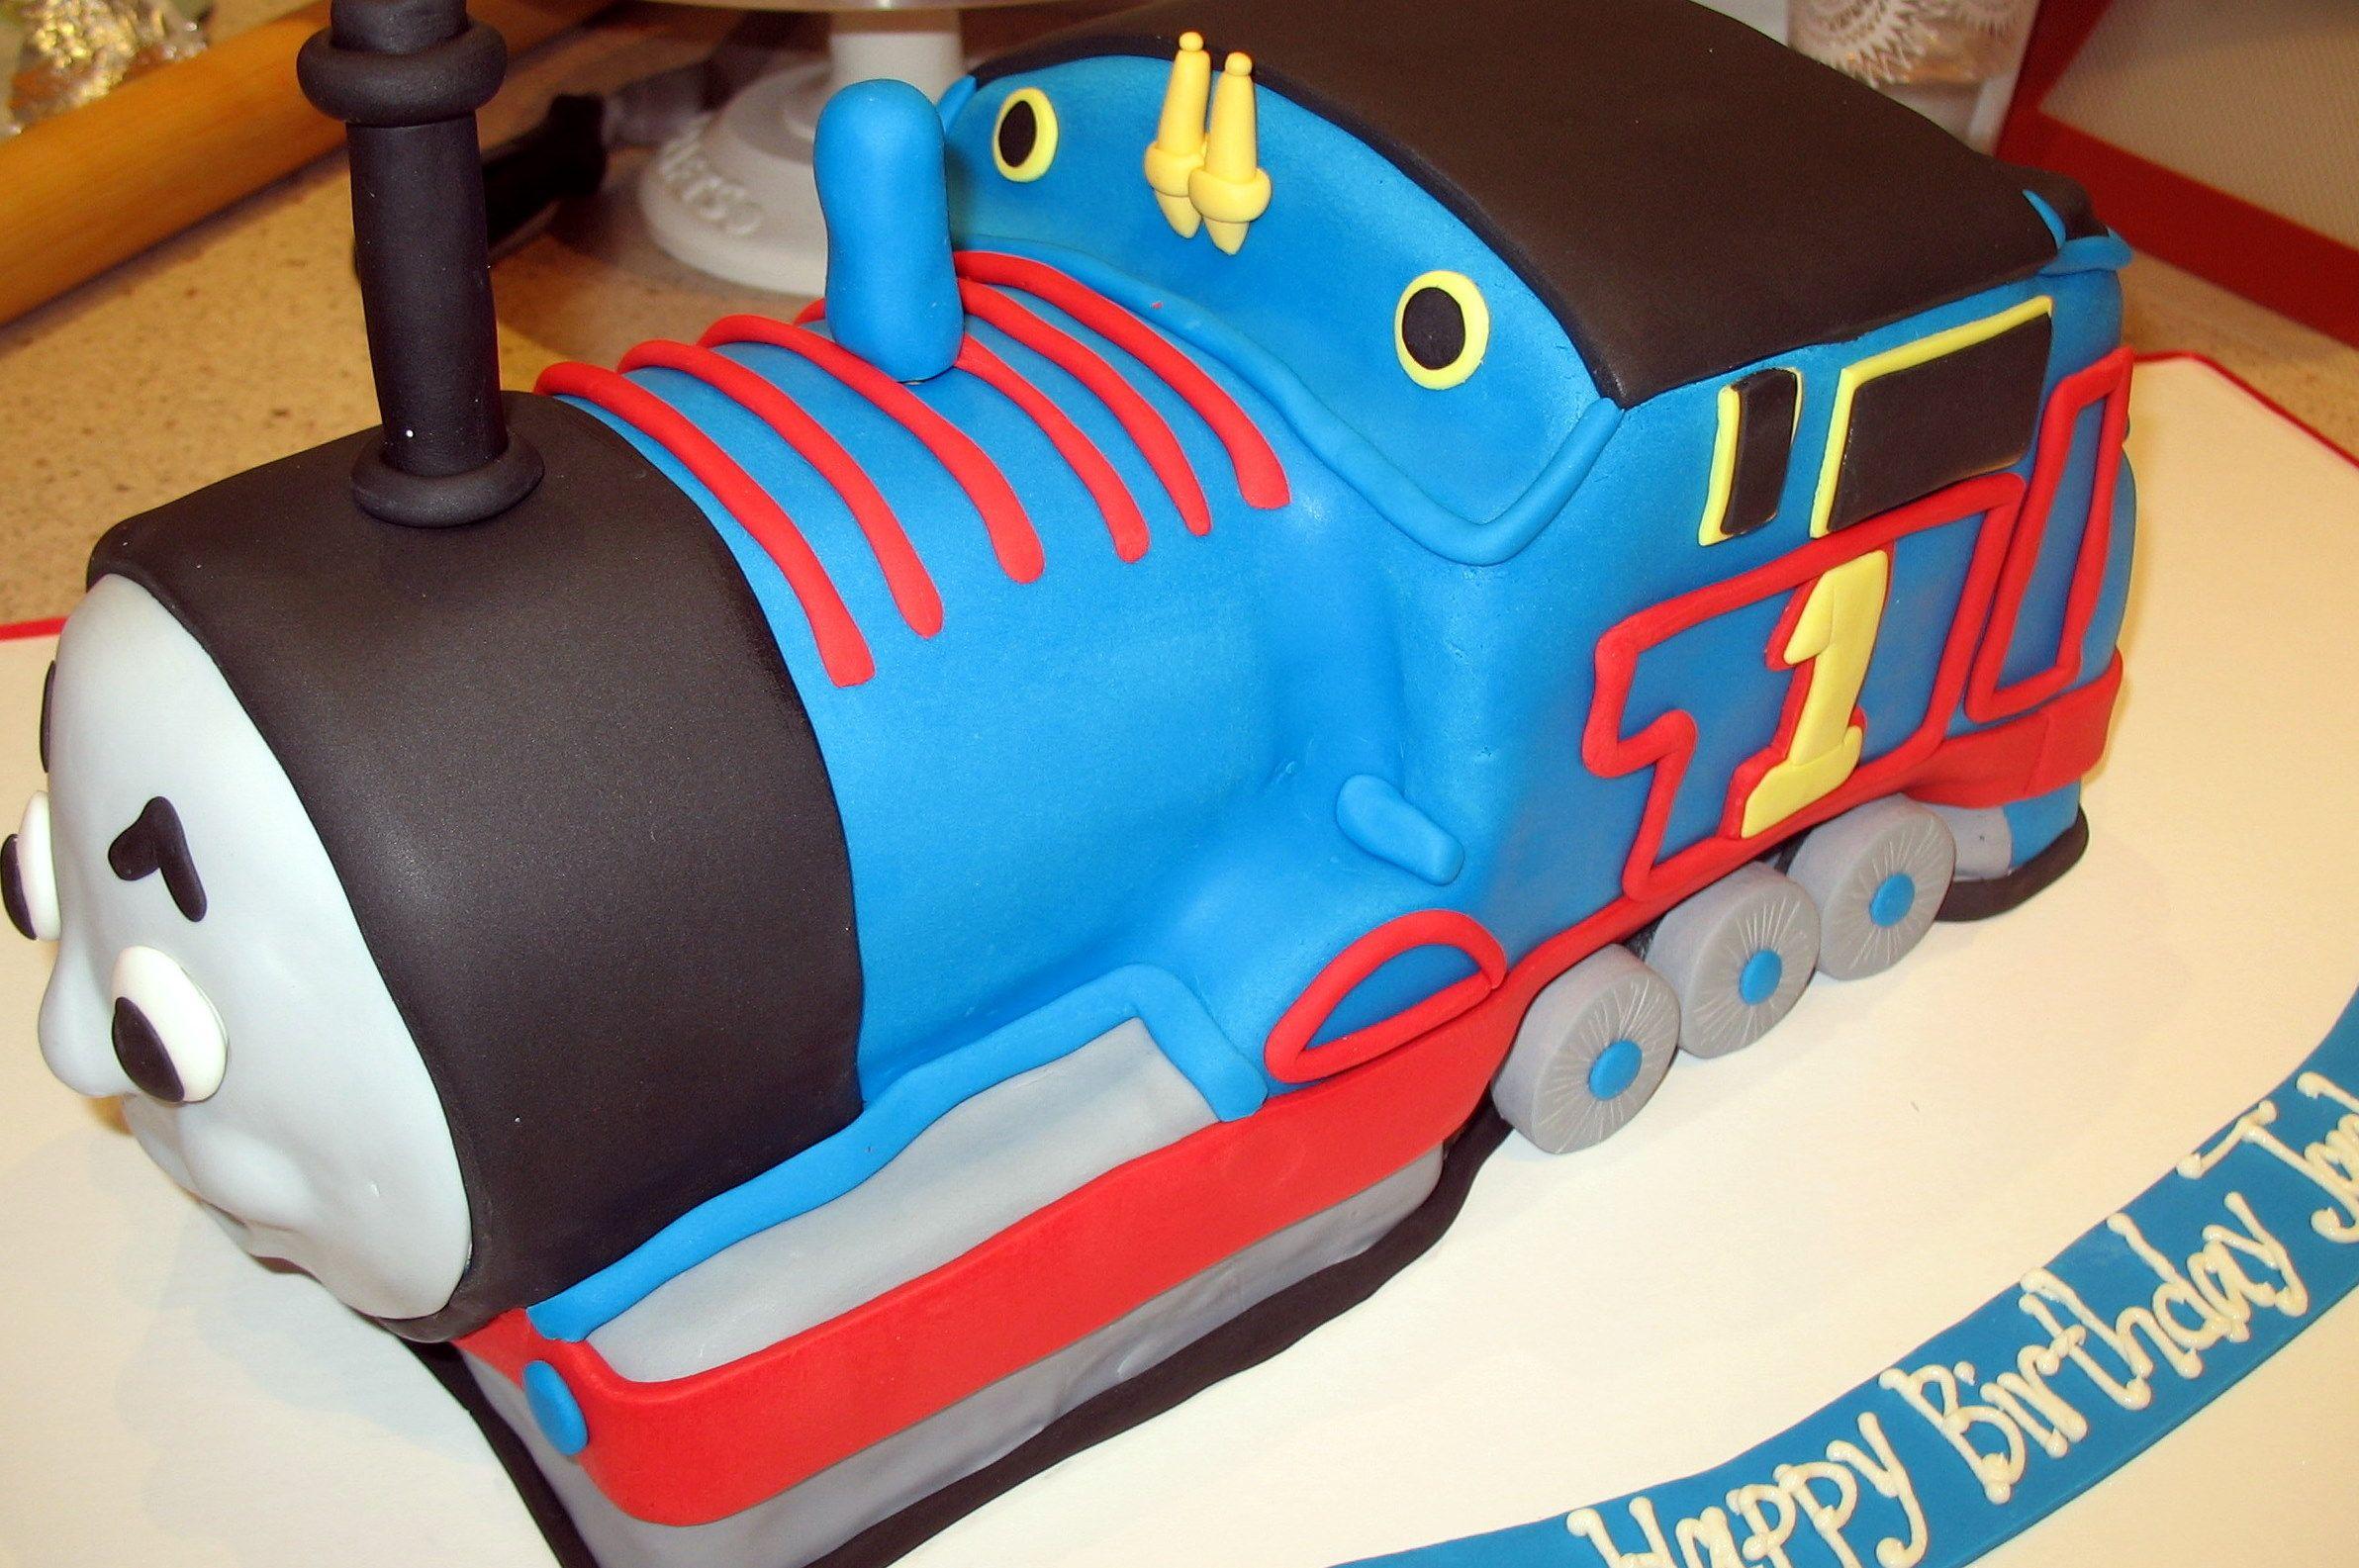 Maxie Bs Bakery Greensboro Nc Maxie Bs Childrens Birthday